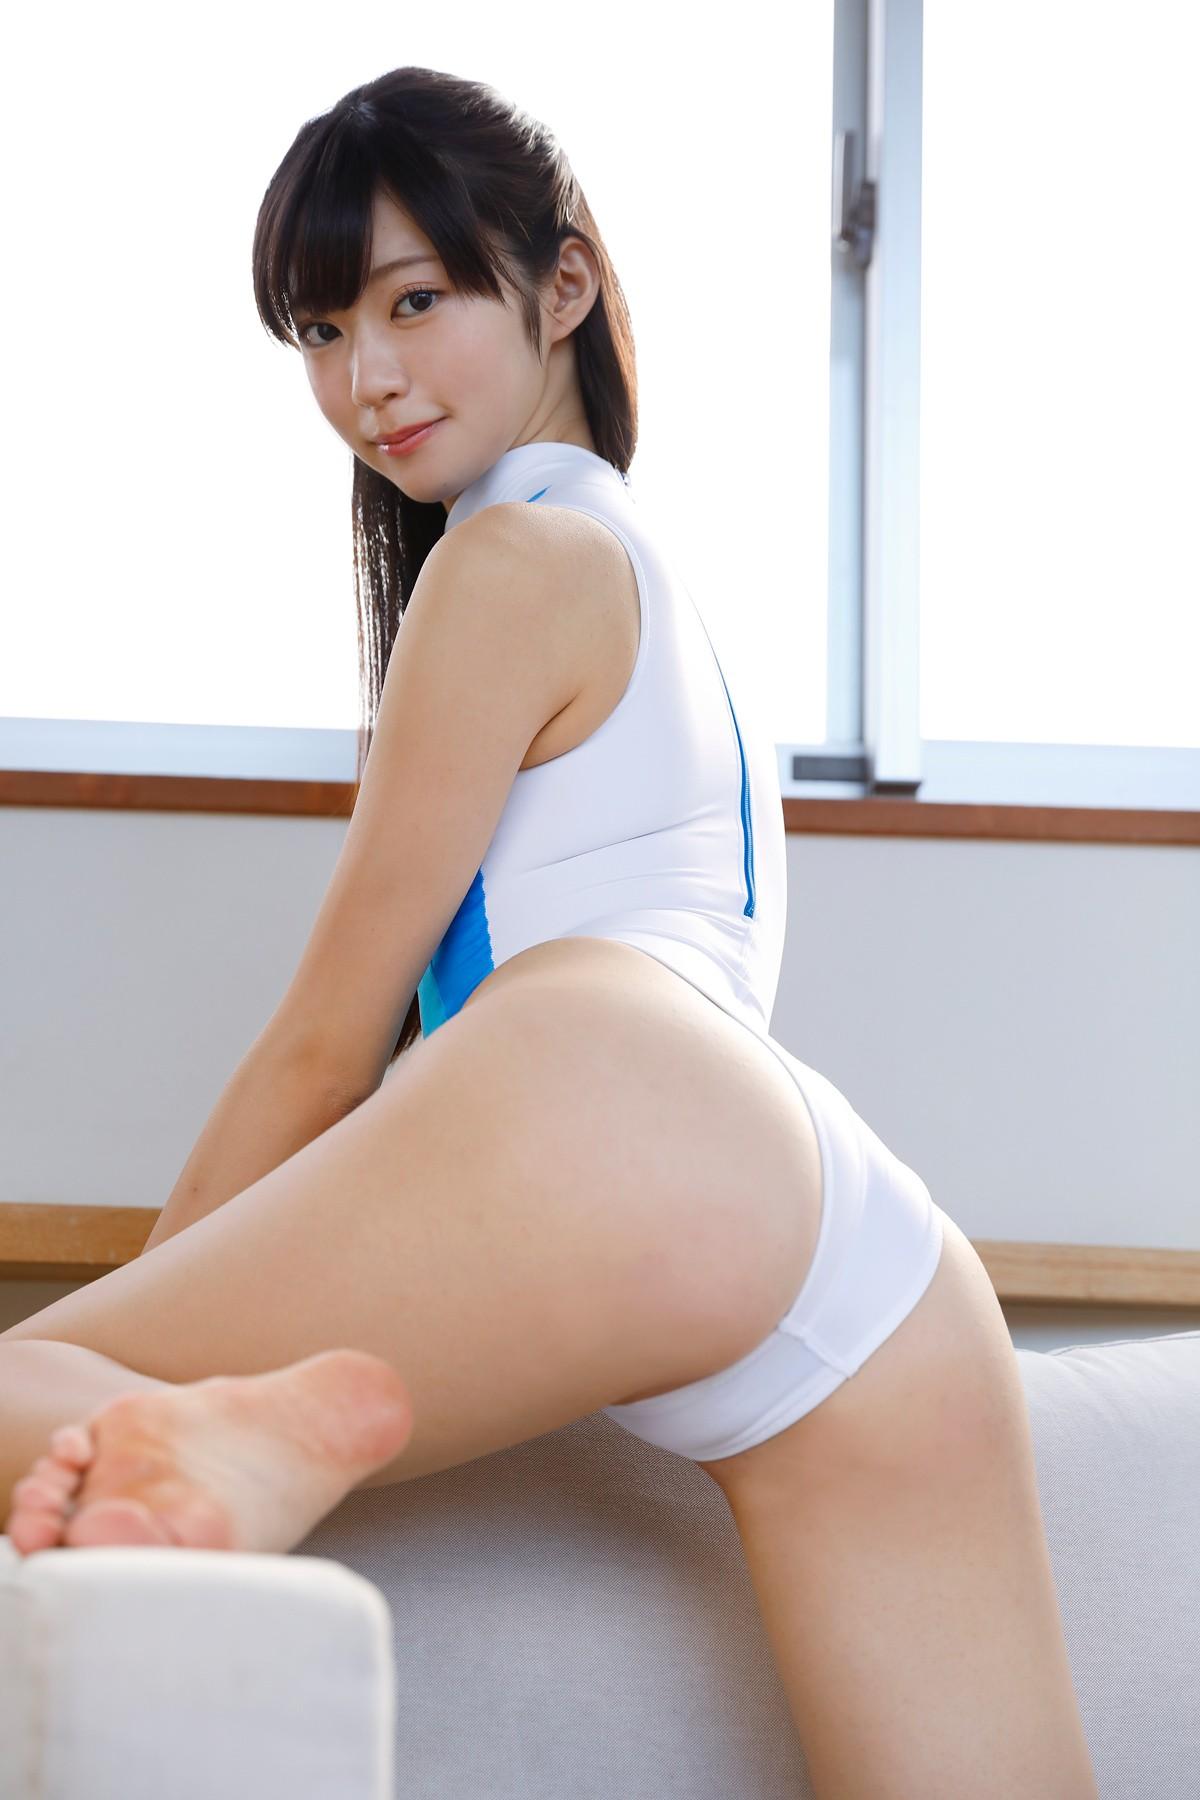 从大尺度写真偶像到 EVA 赛车女郎-田中めい推荐